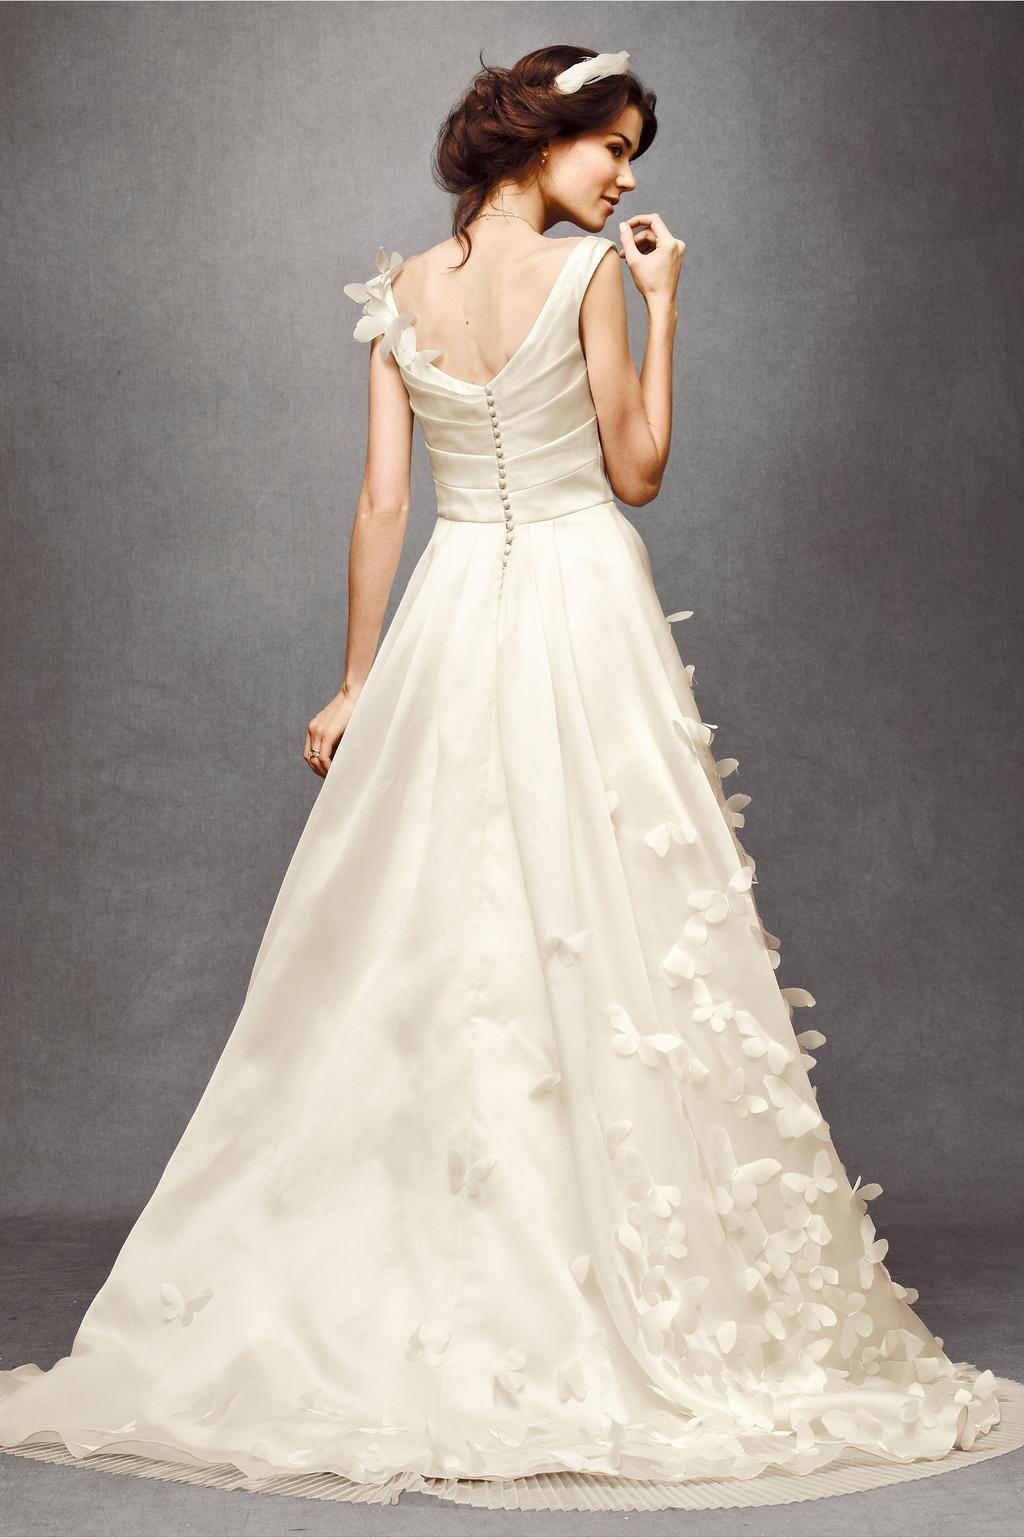 Ethereal-monarch-2011-wedding-dress-bhldn-a-line-ivory-v-neck-back.full